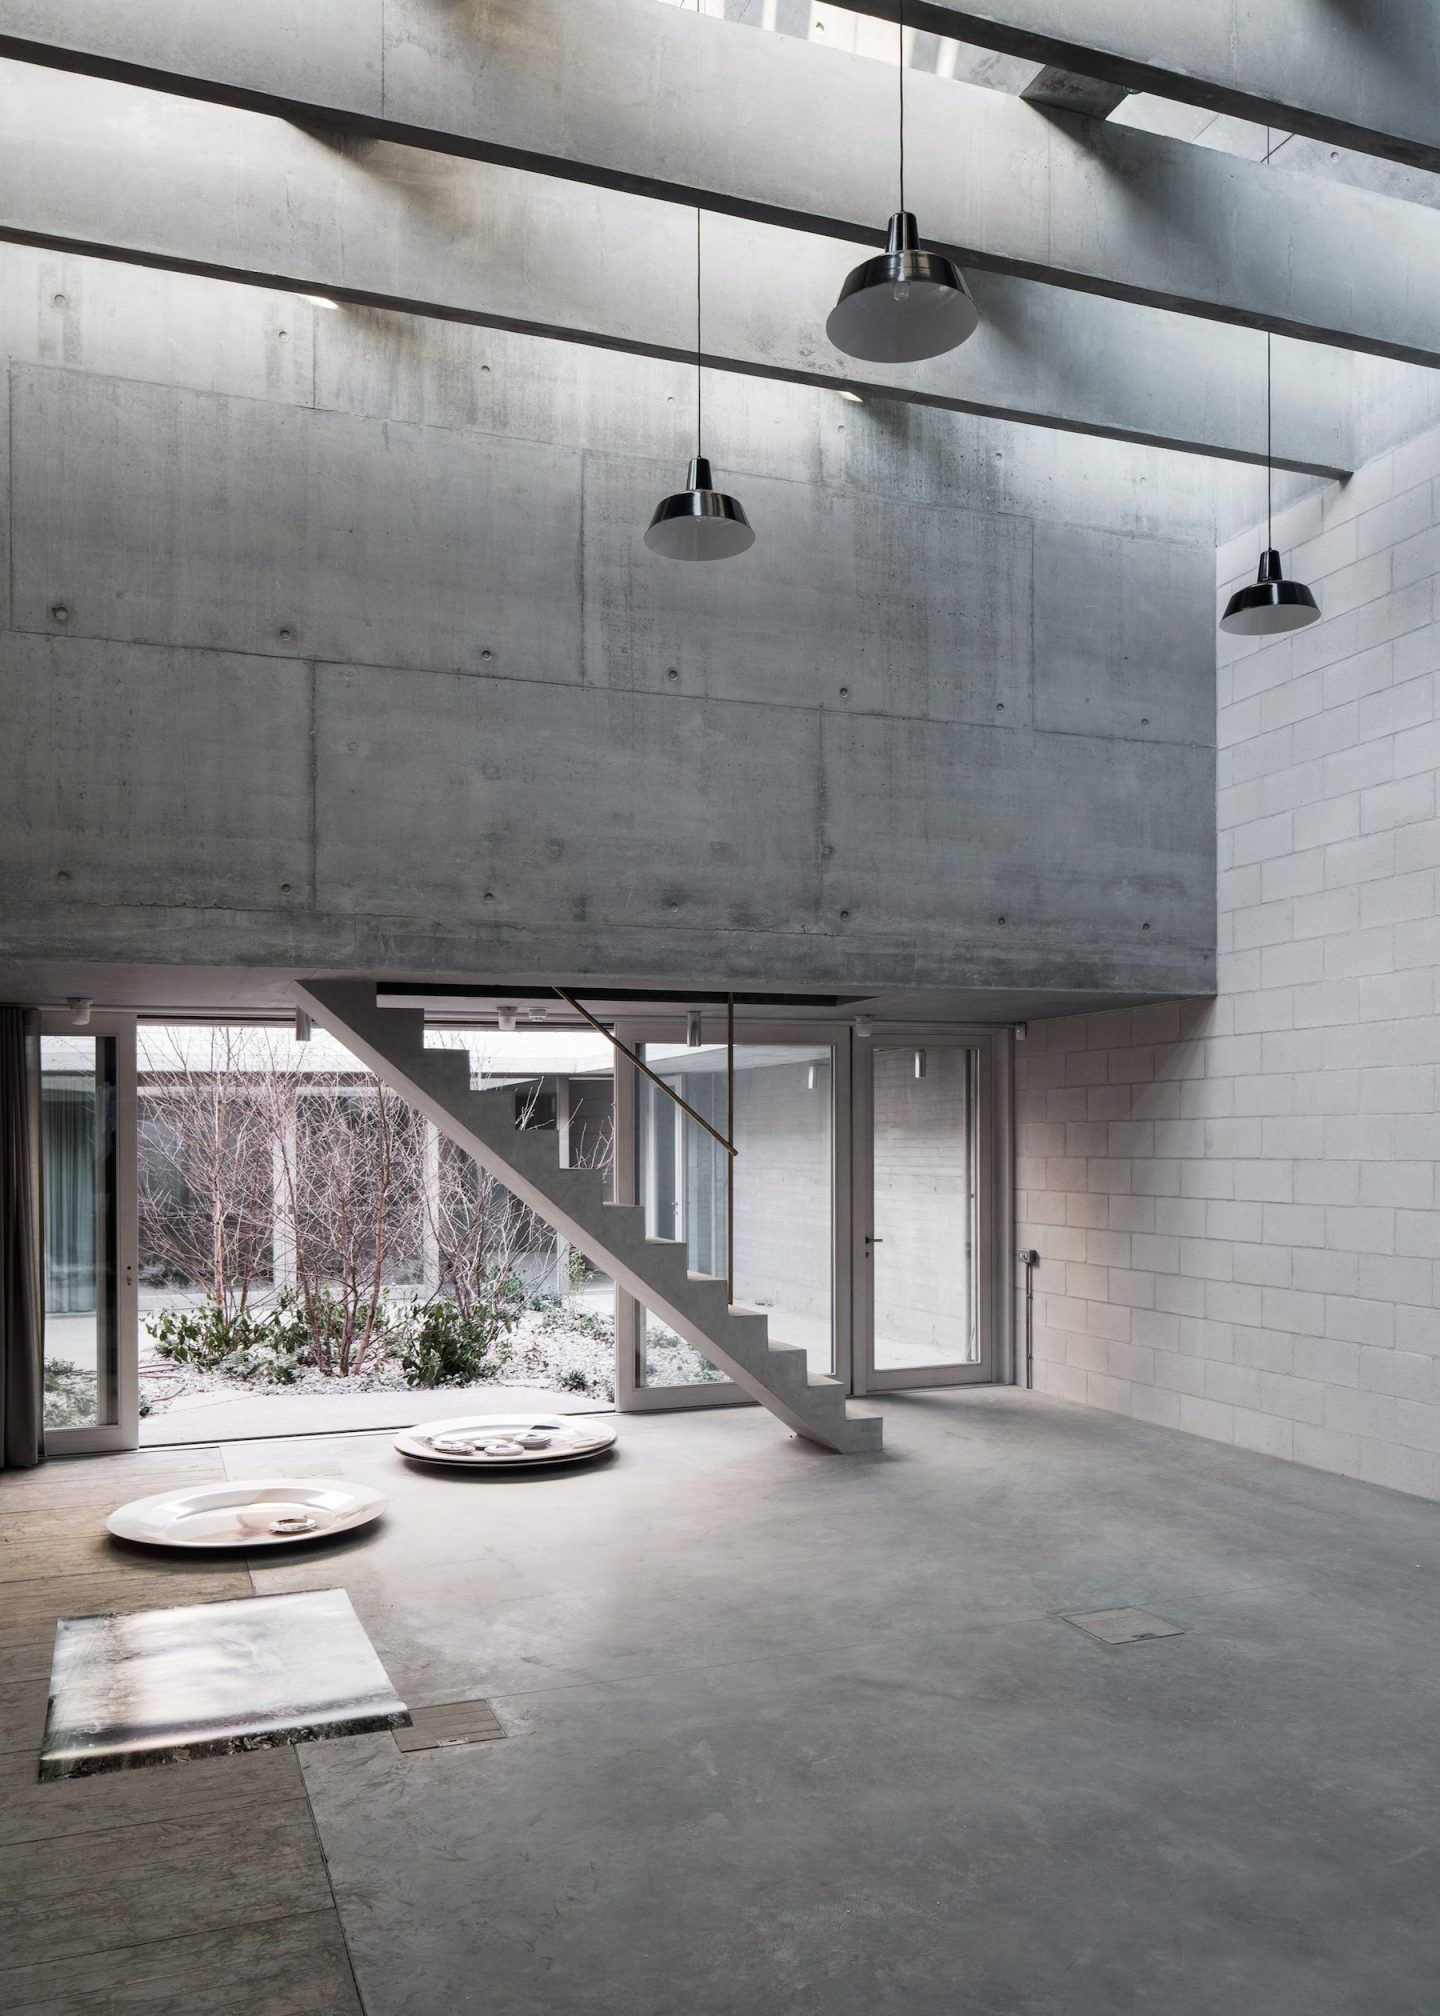 iGNANT-Architecture-6a-Architects-Juergen-Teller-Studio-004